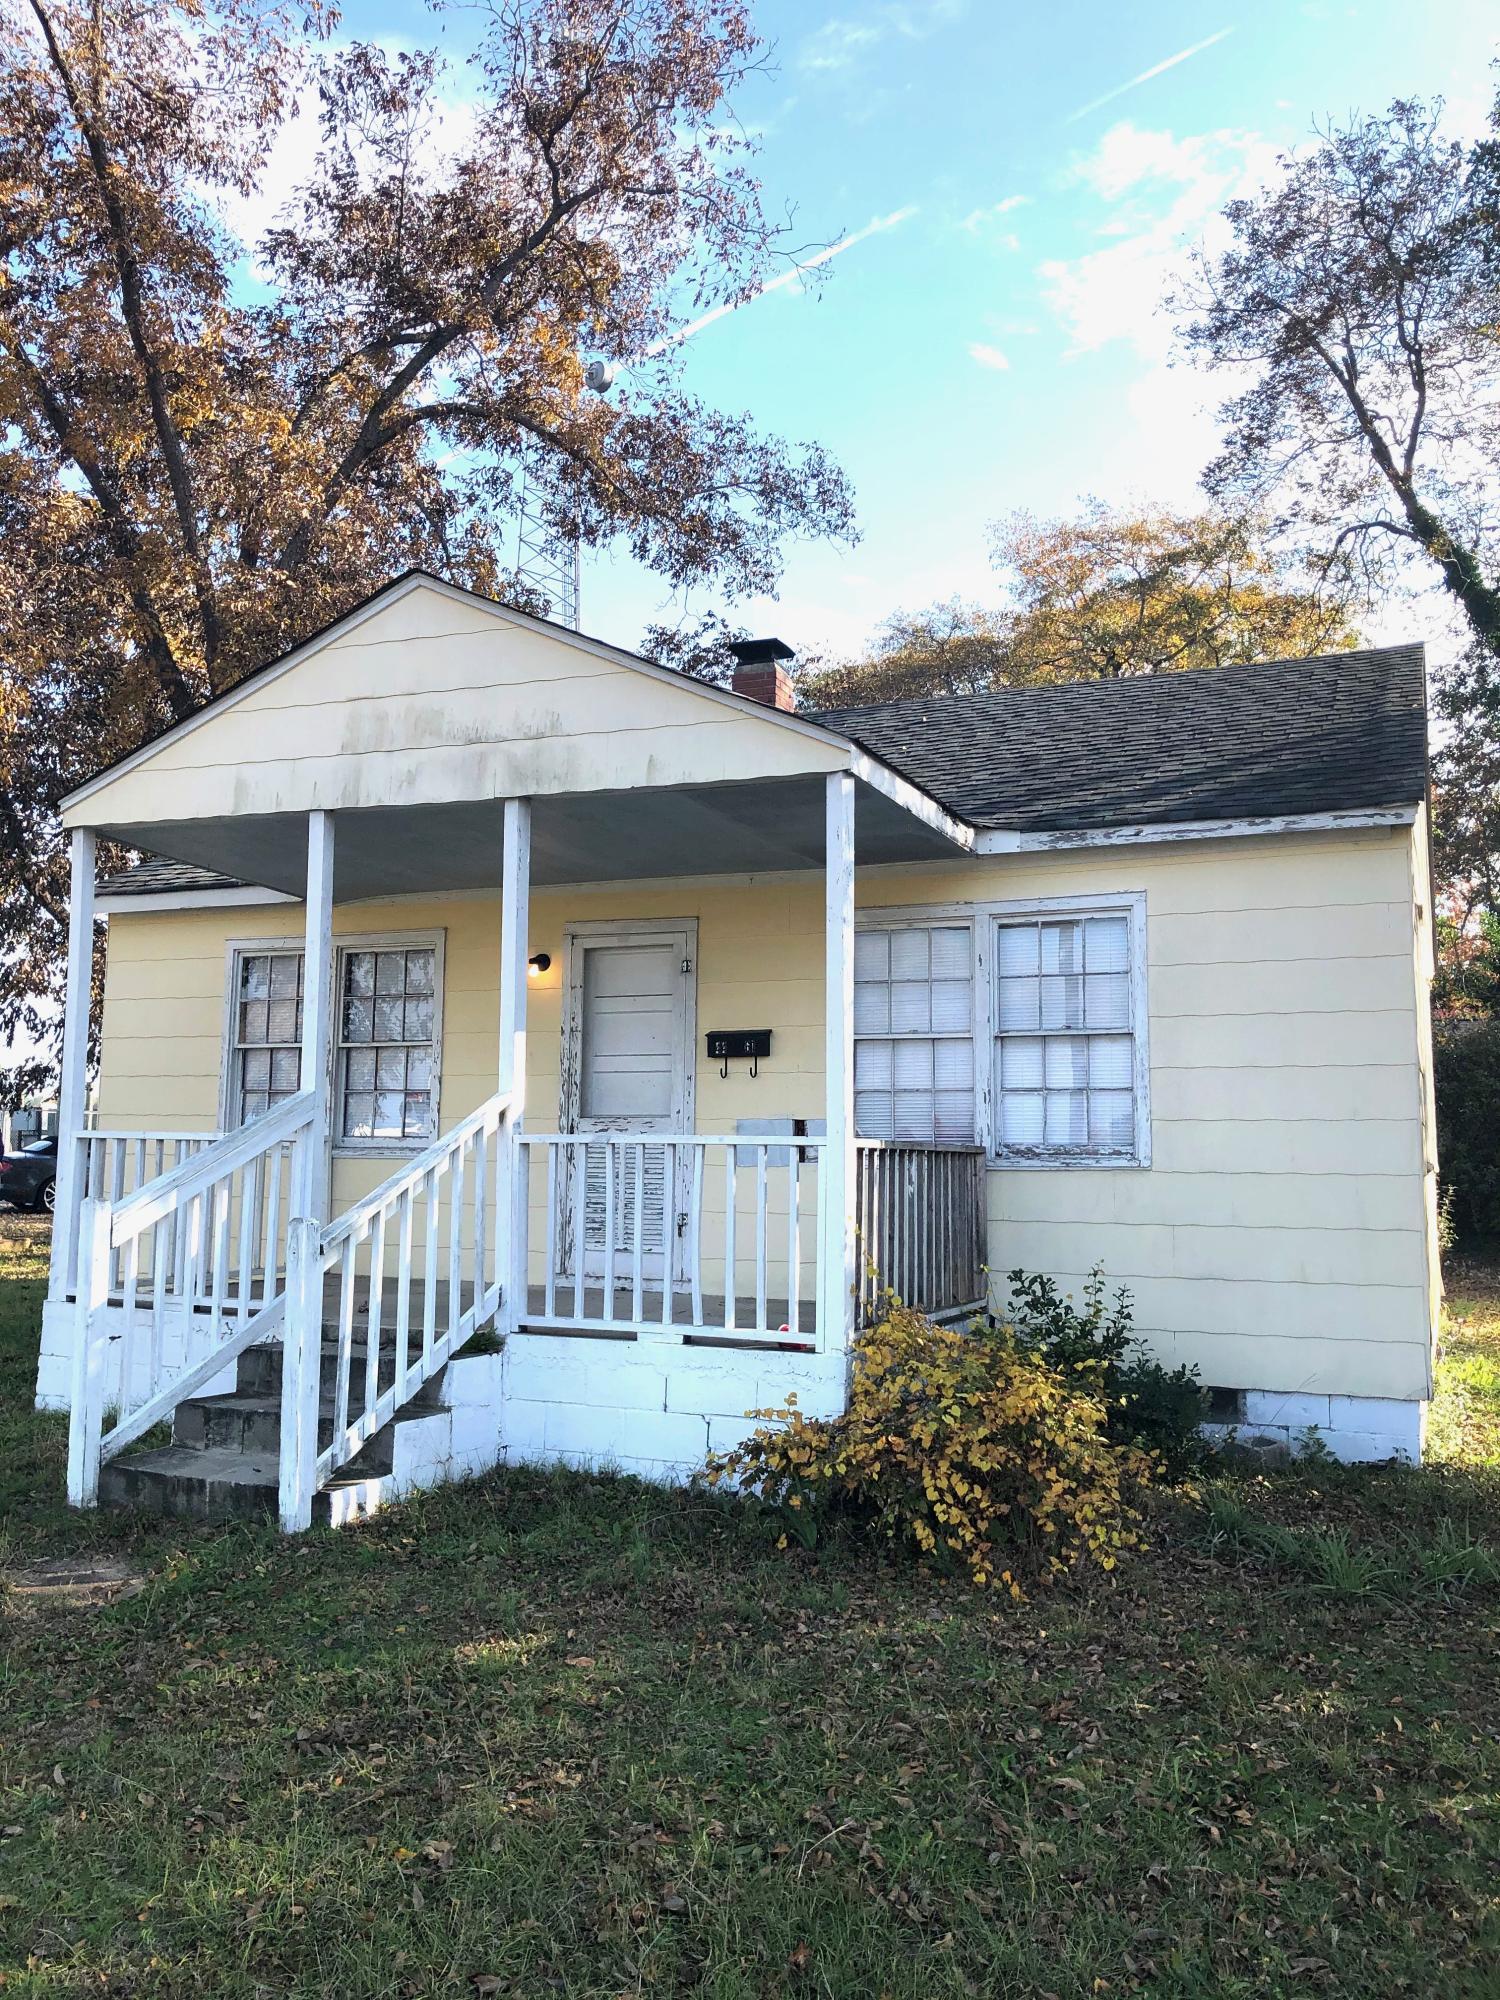 4461 Savannah Highway North, SC 29112